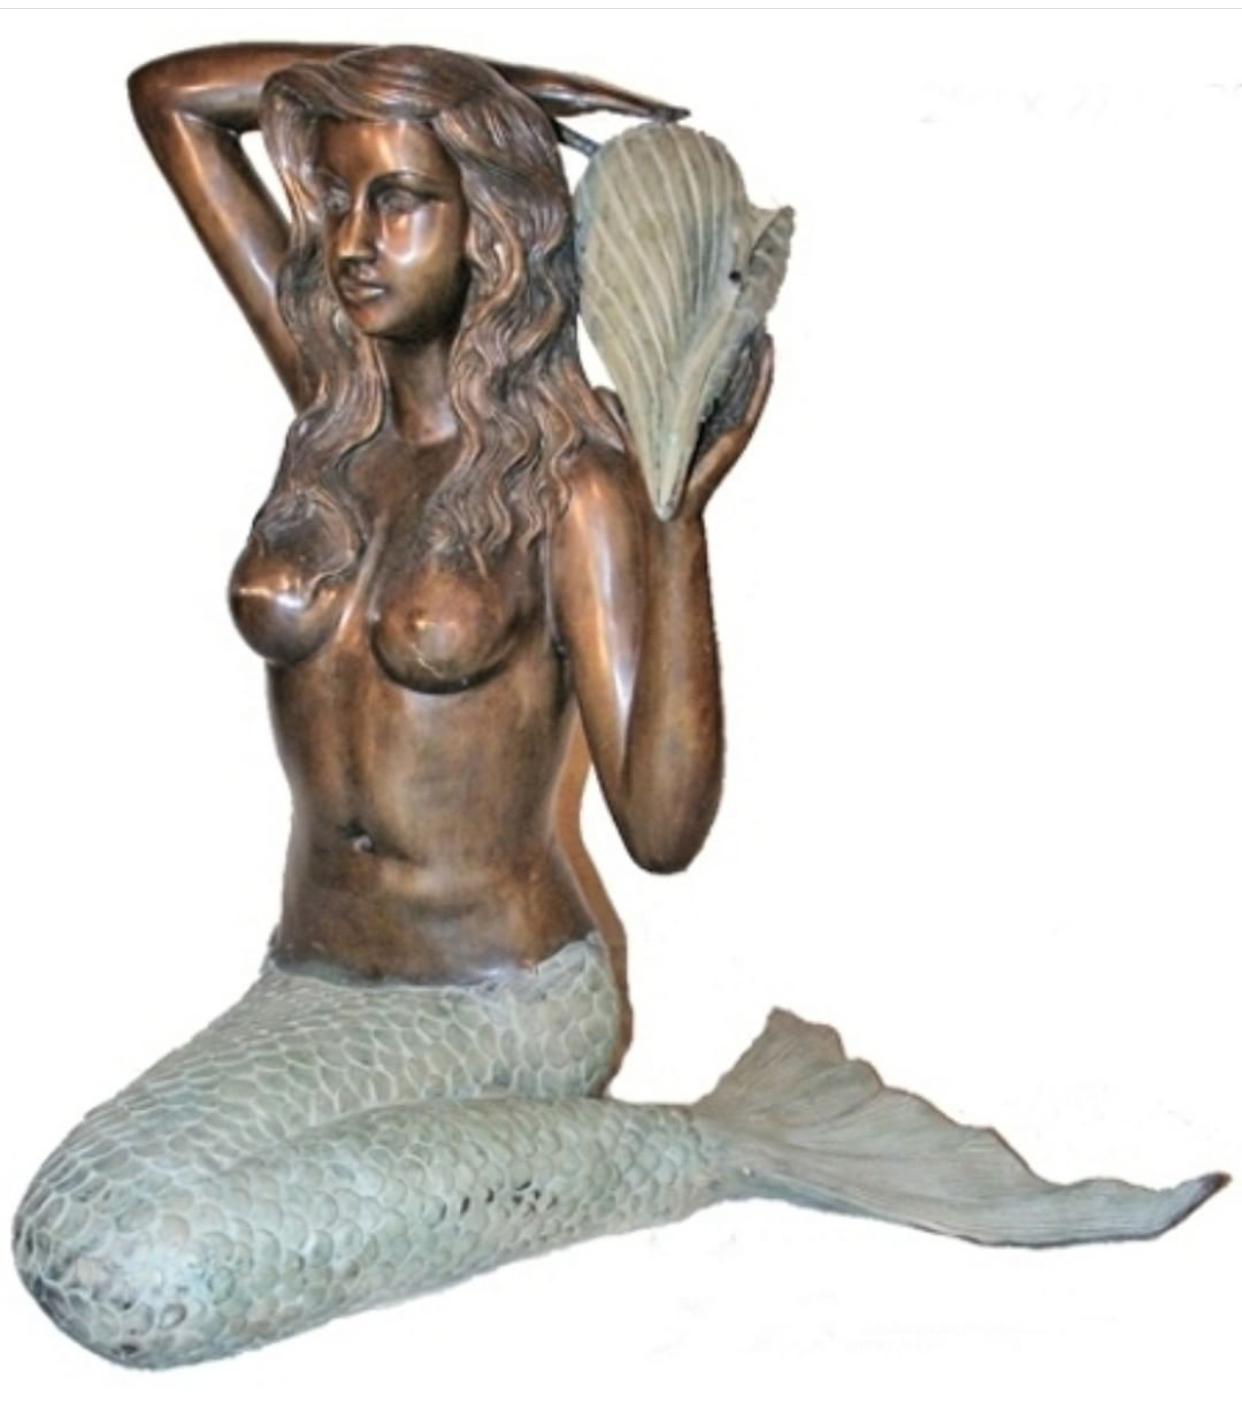 Bronze mermaid fountain sculpture